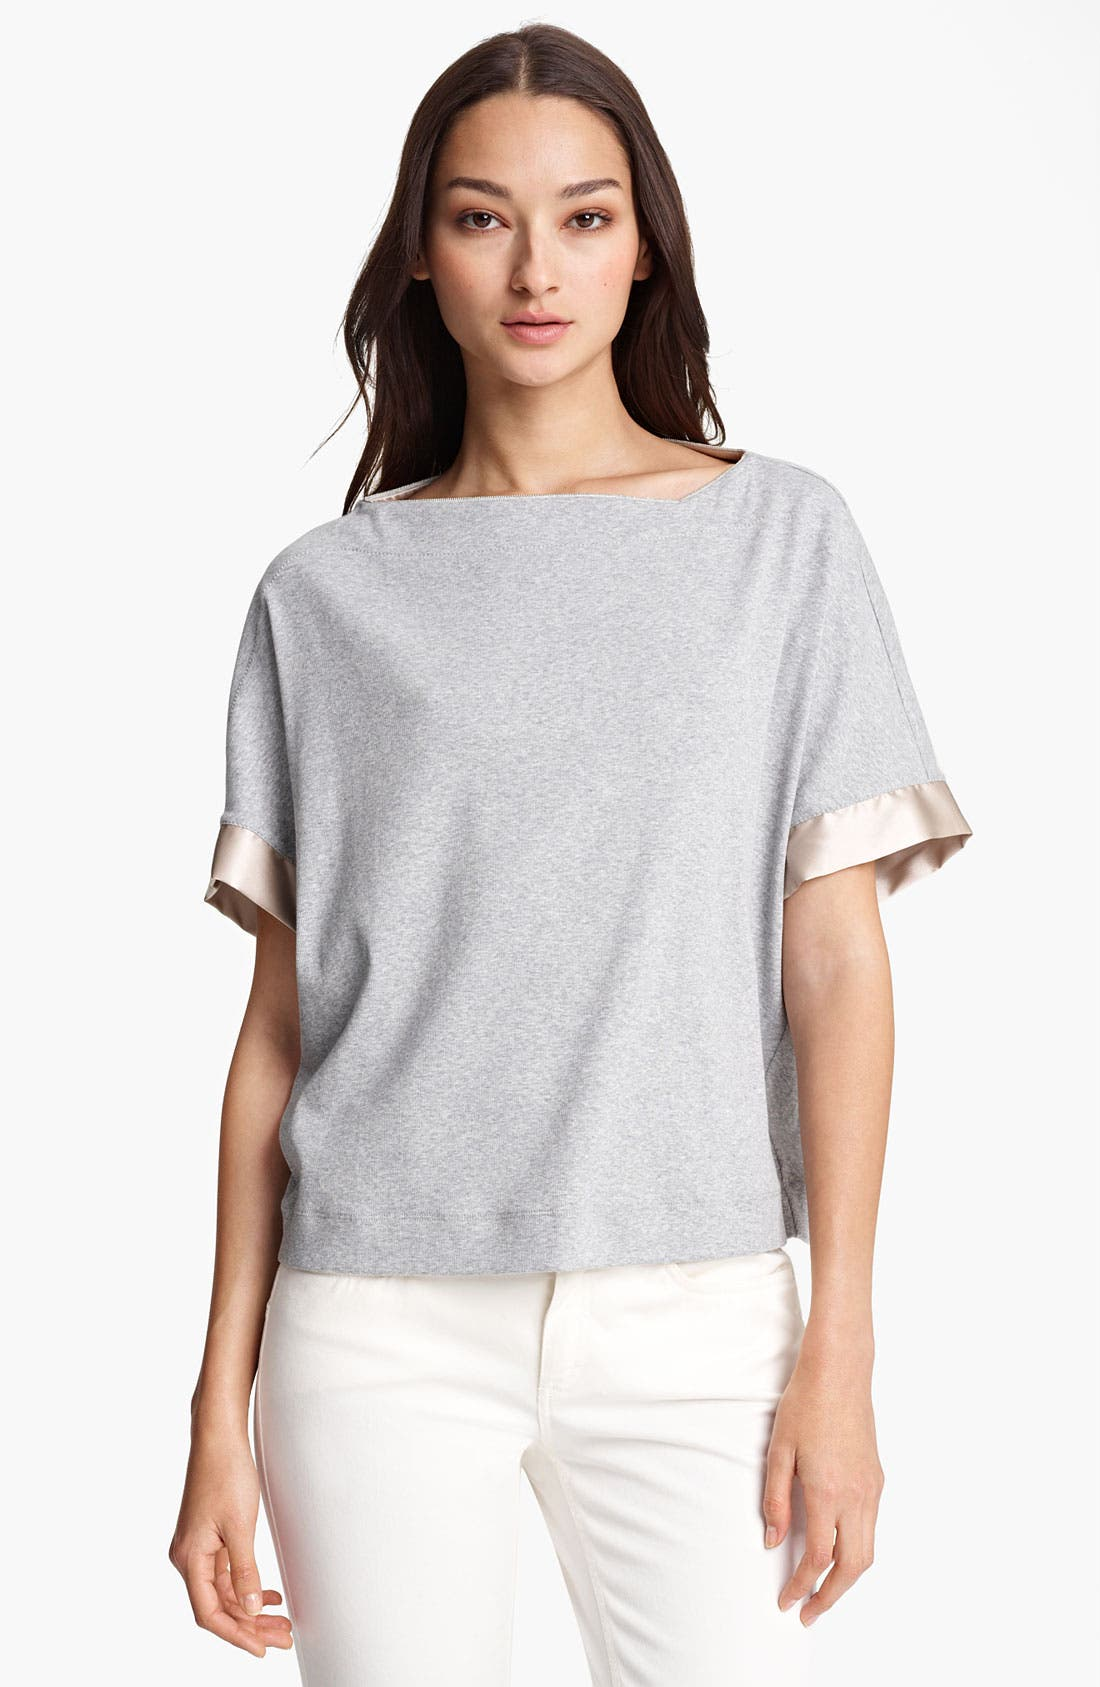 Alternate Image 1 Selected - Fabiana Filippi Rib Knit Jersey Top